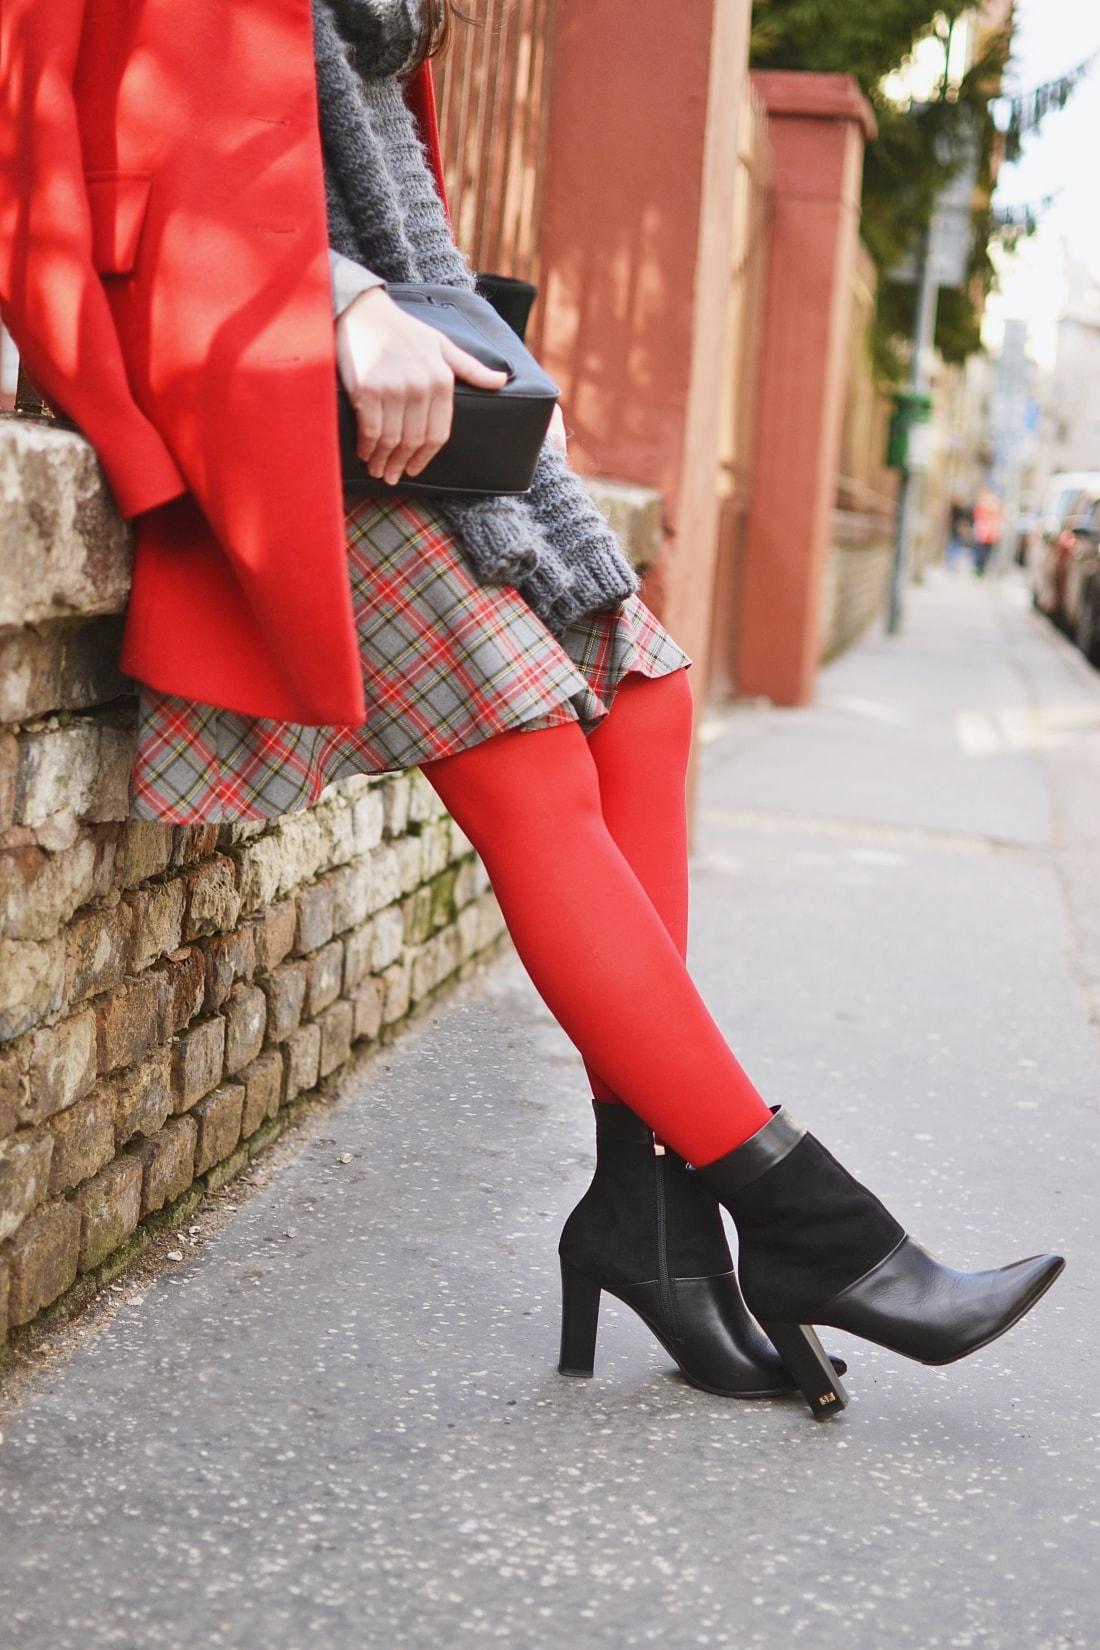 Červená_Katharine-fashion is beautiful_blog 11_Červené pančuchy_Červený kabát_Károvaná sukňa_Katarína Jakubčová_Fashion blogger_Outfit